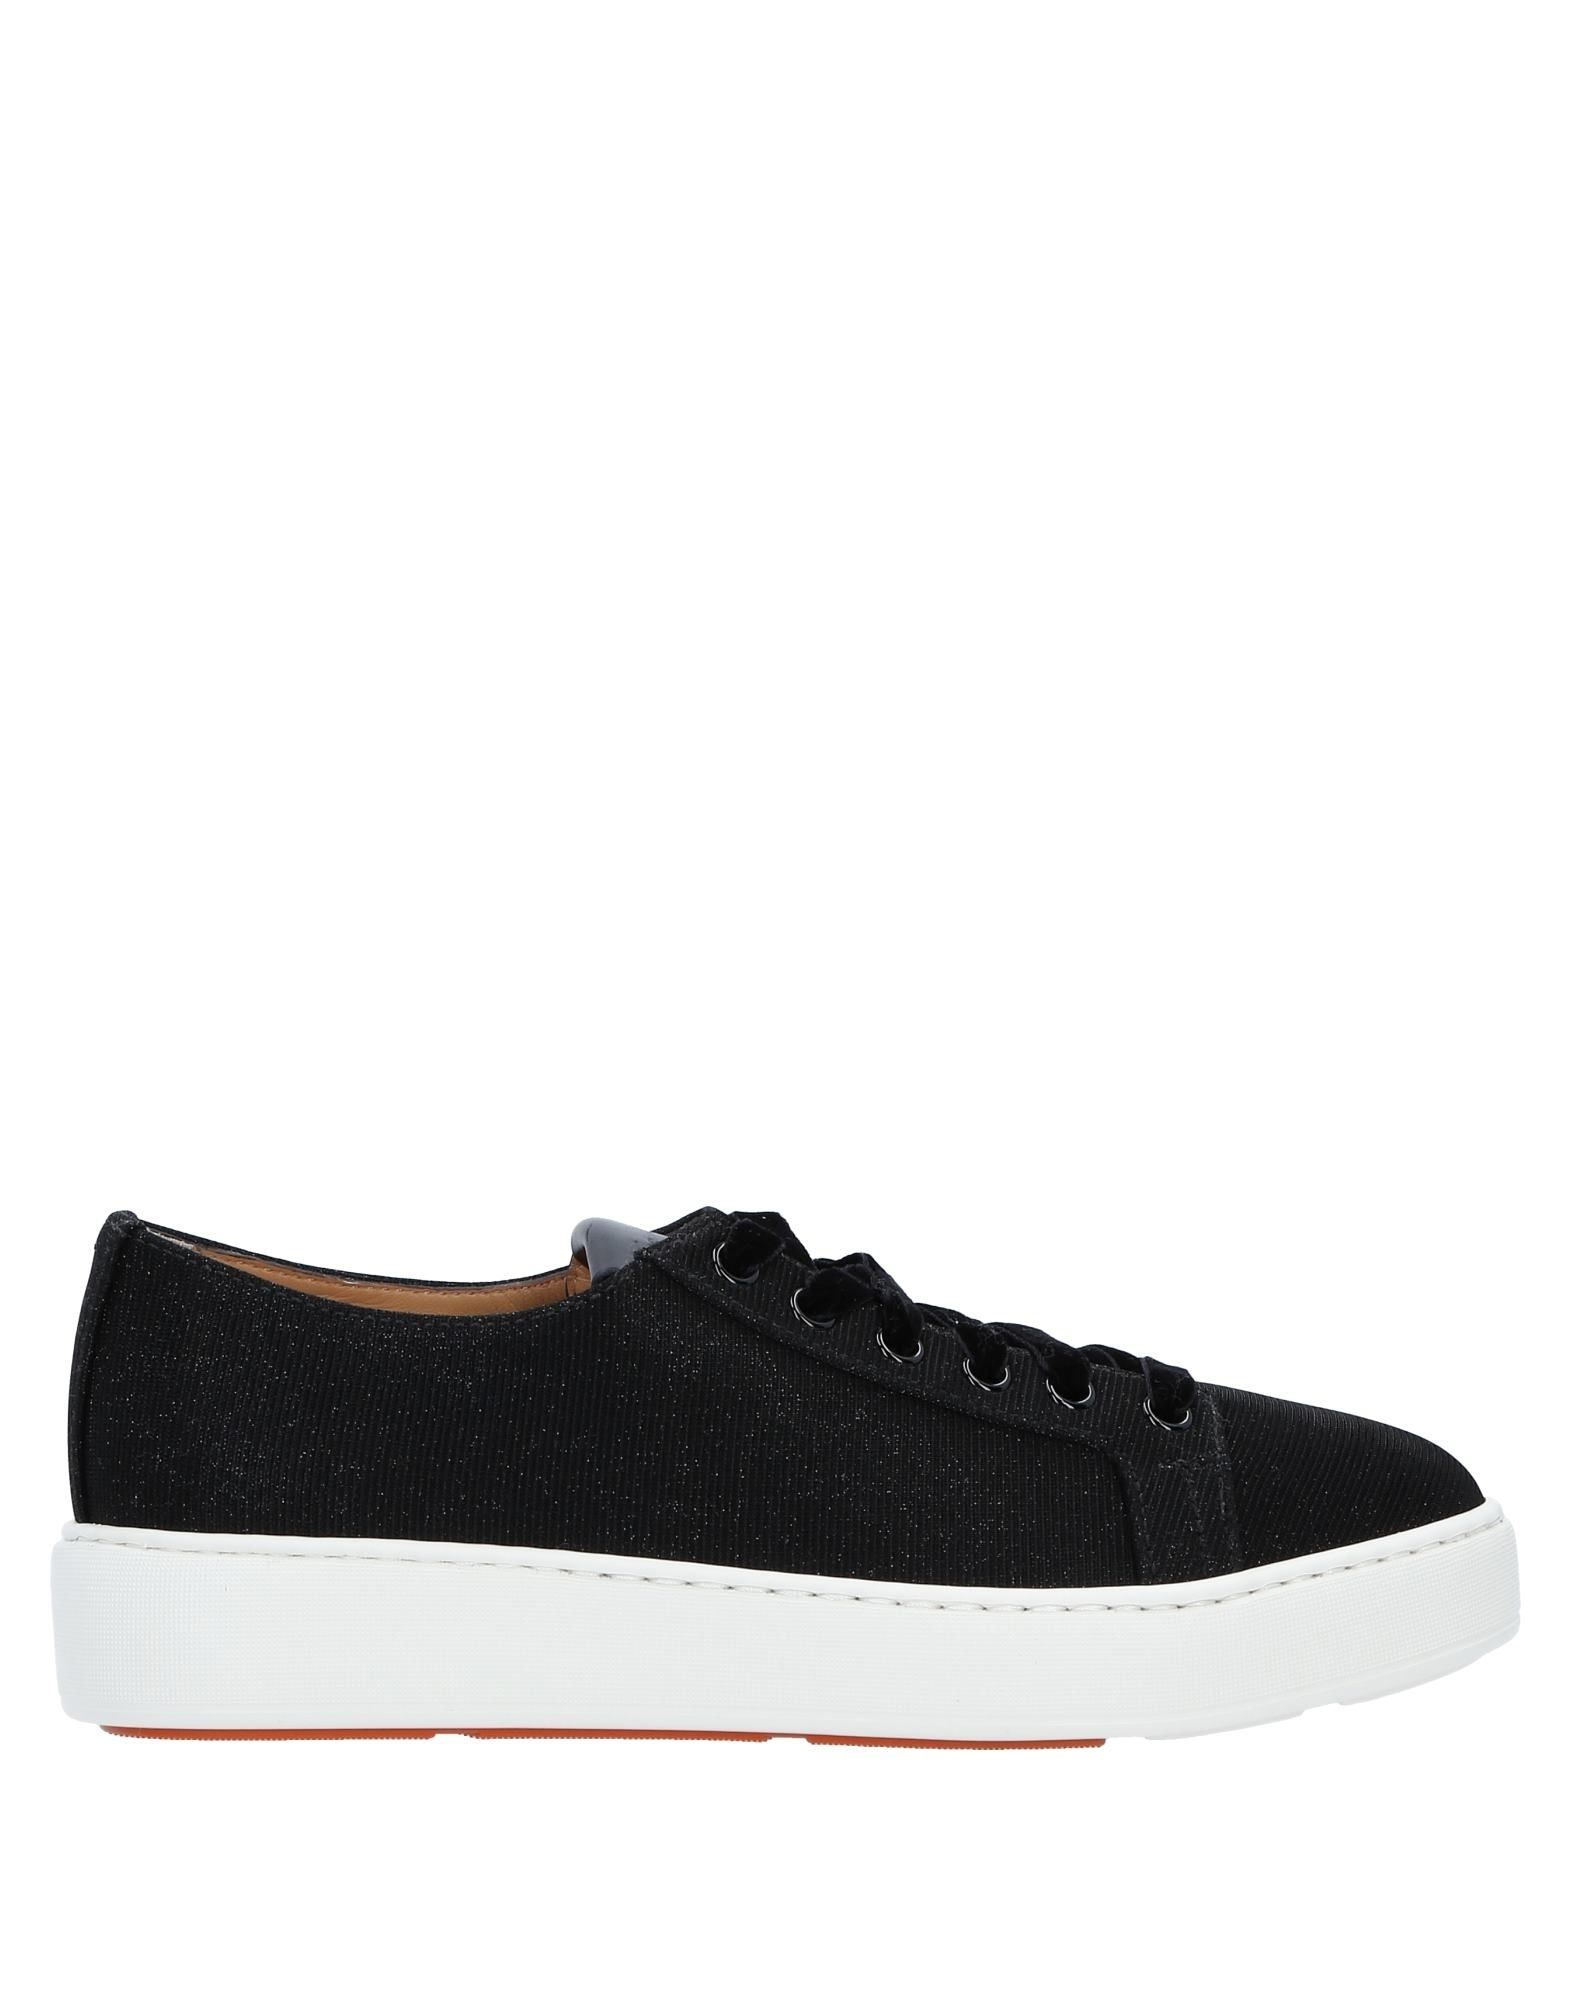 Rabatt Schuhe Santoni Sneakers Damen  11542240MV